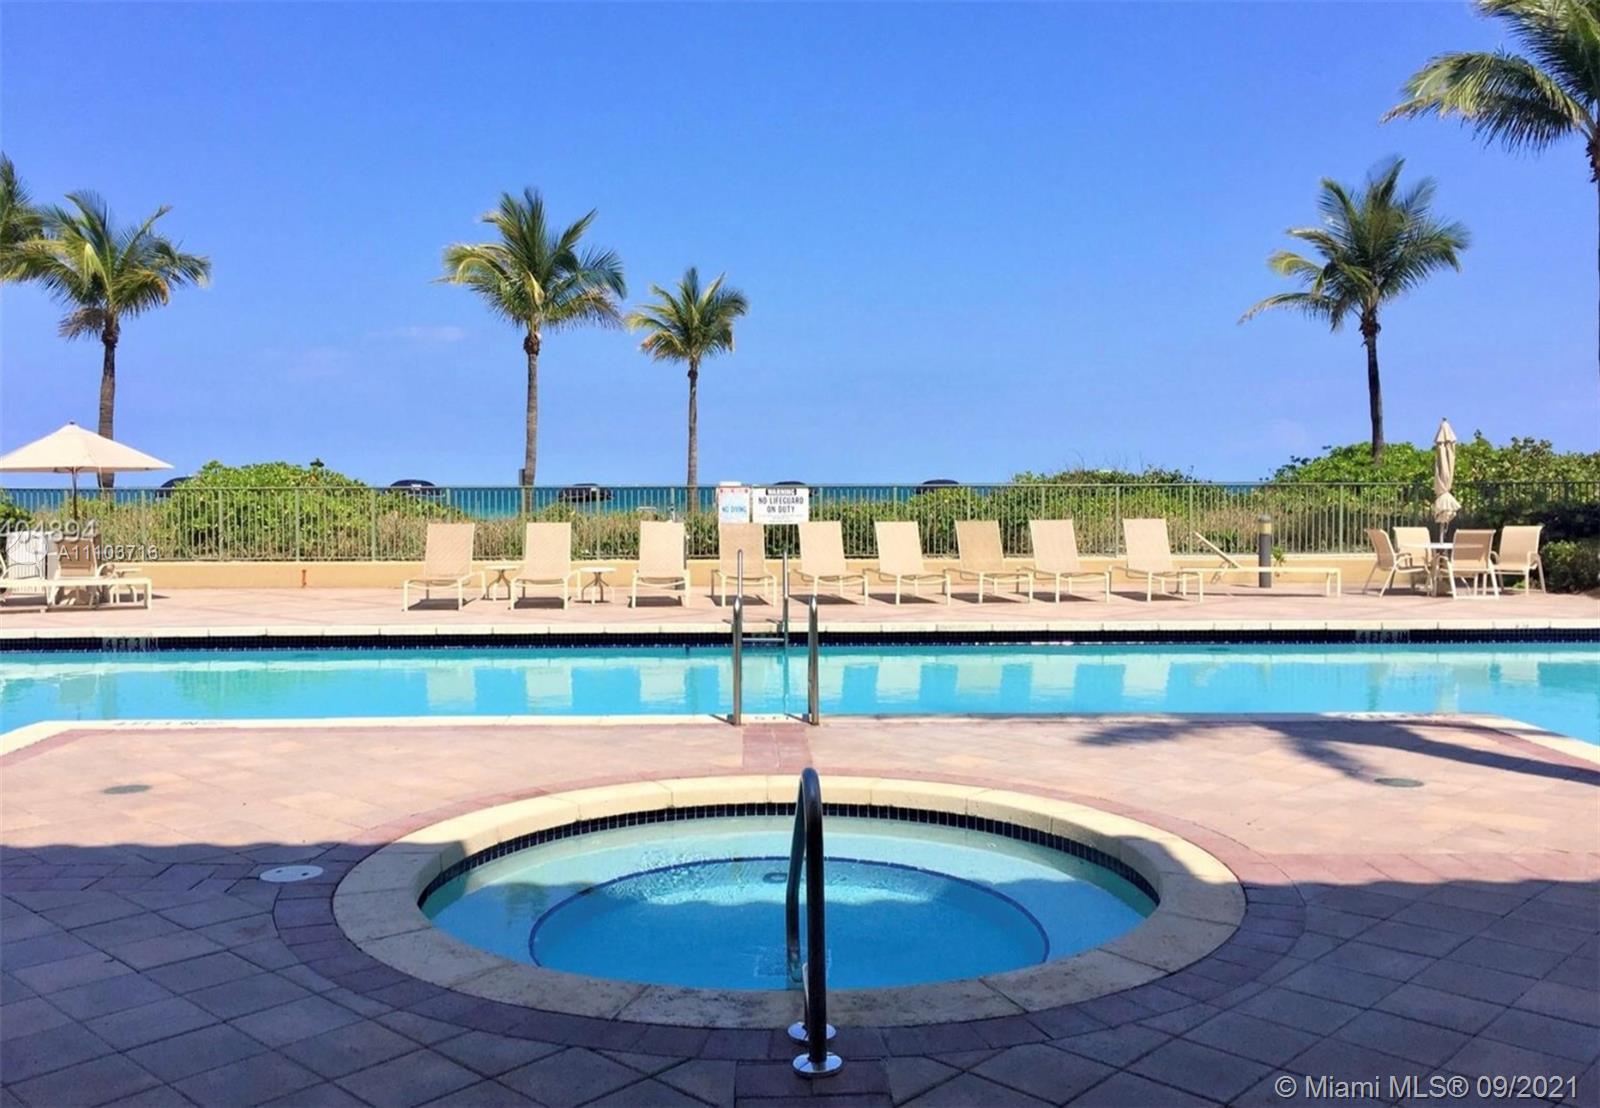 2080 Hallandale #1104 - 2080 S Ocean Dr #1104, Hallandale Beach, FL 33009